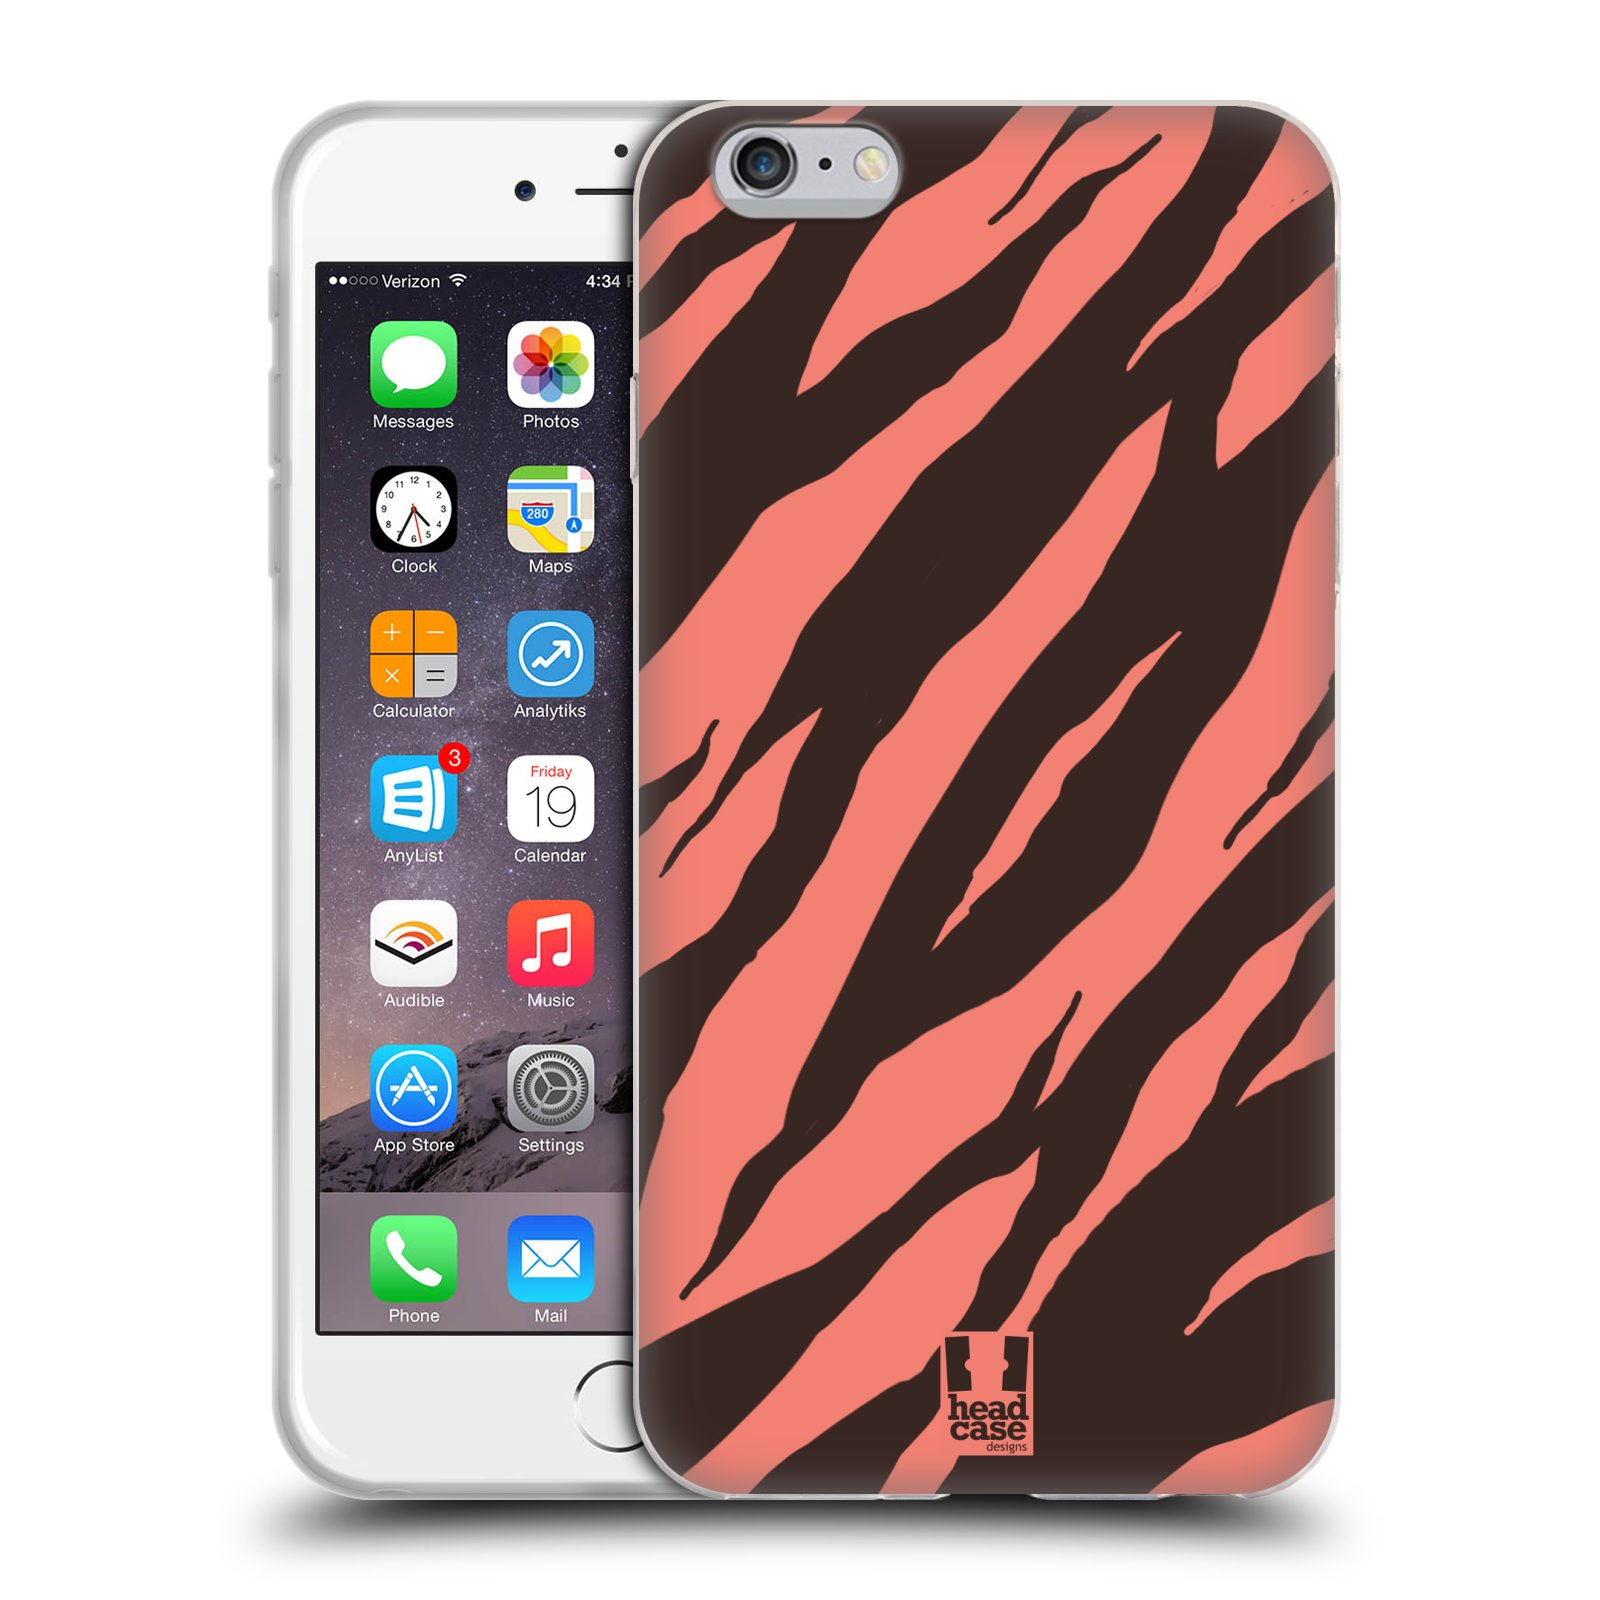 HEAD CASE silikonový obal na mobil Apple Iphone 6 PLUS/ 6S PLUS vzor Divočina zvíře 2 korálový tygr